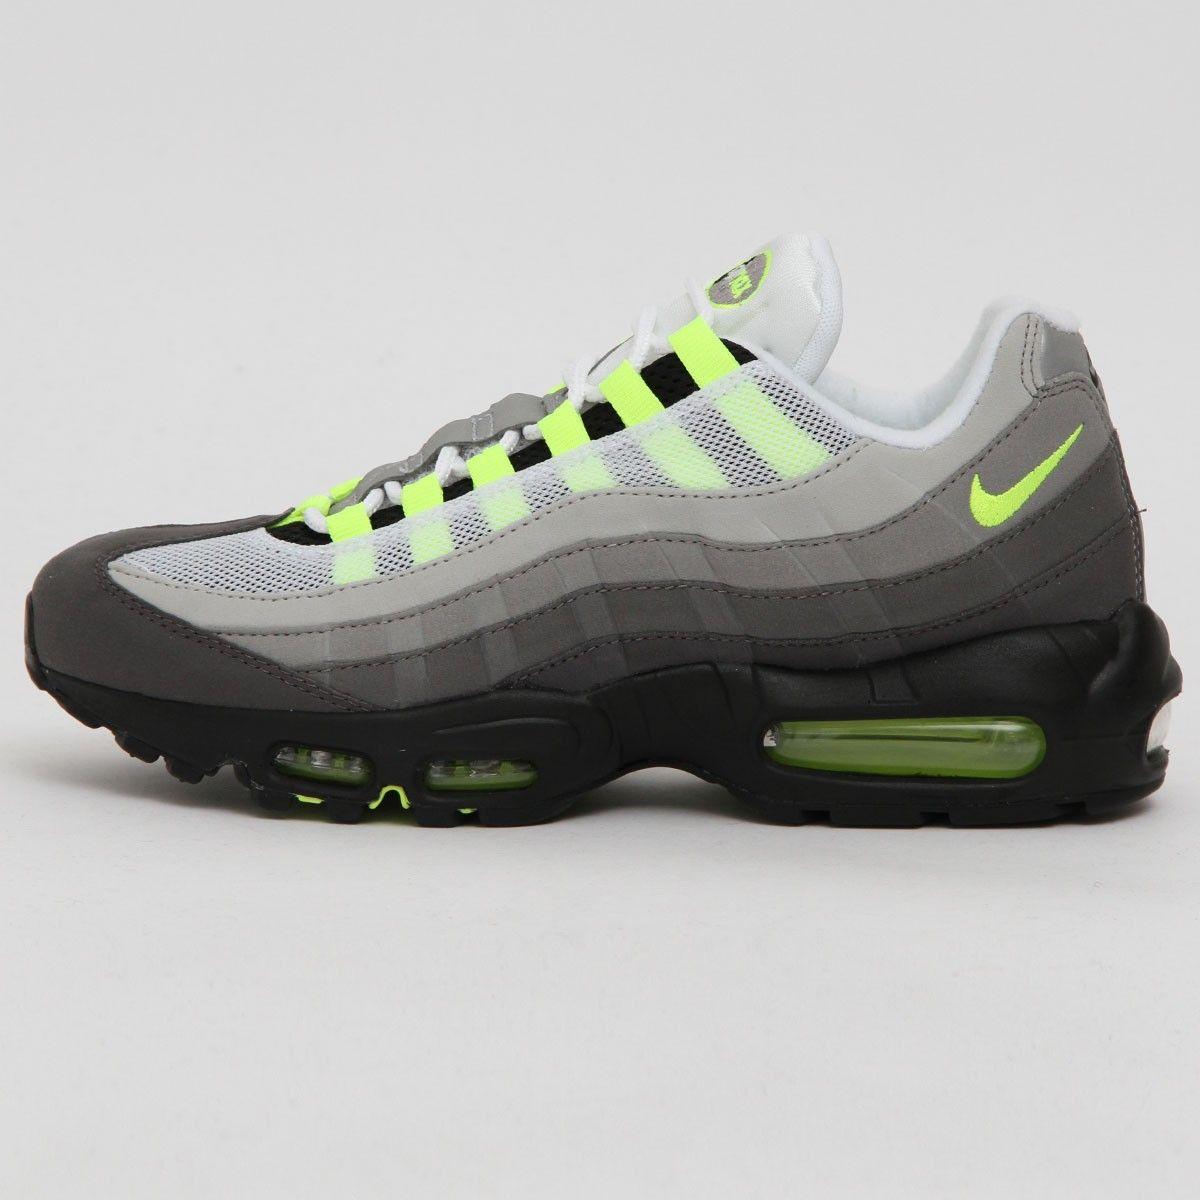 promo code 998d2 a3e0a Nike Air Max 95 OG    Neon  Black Volt . 2015. 554970-071.